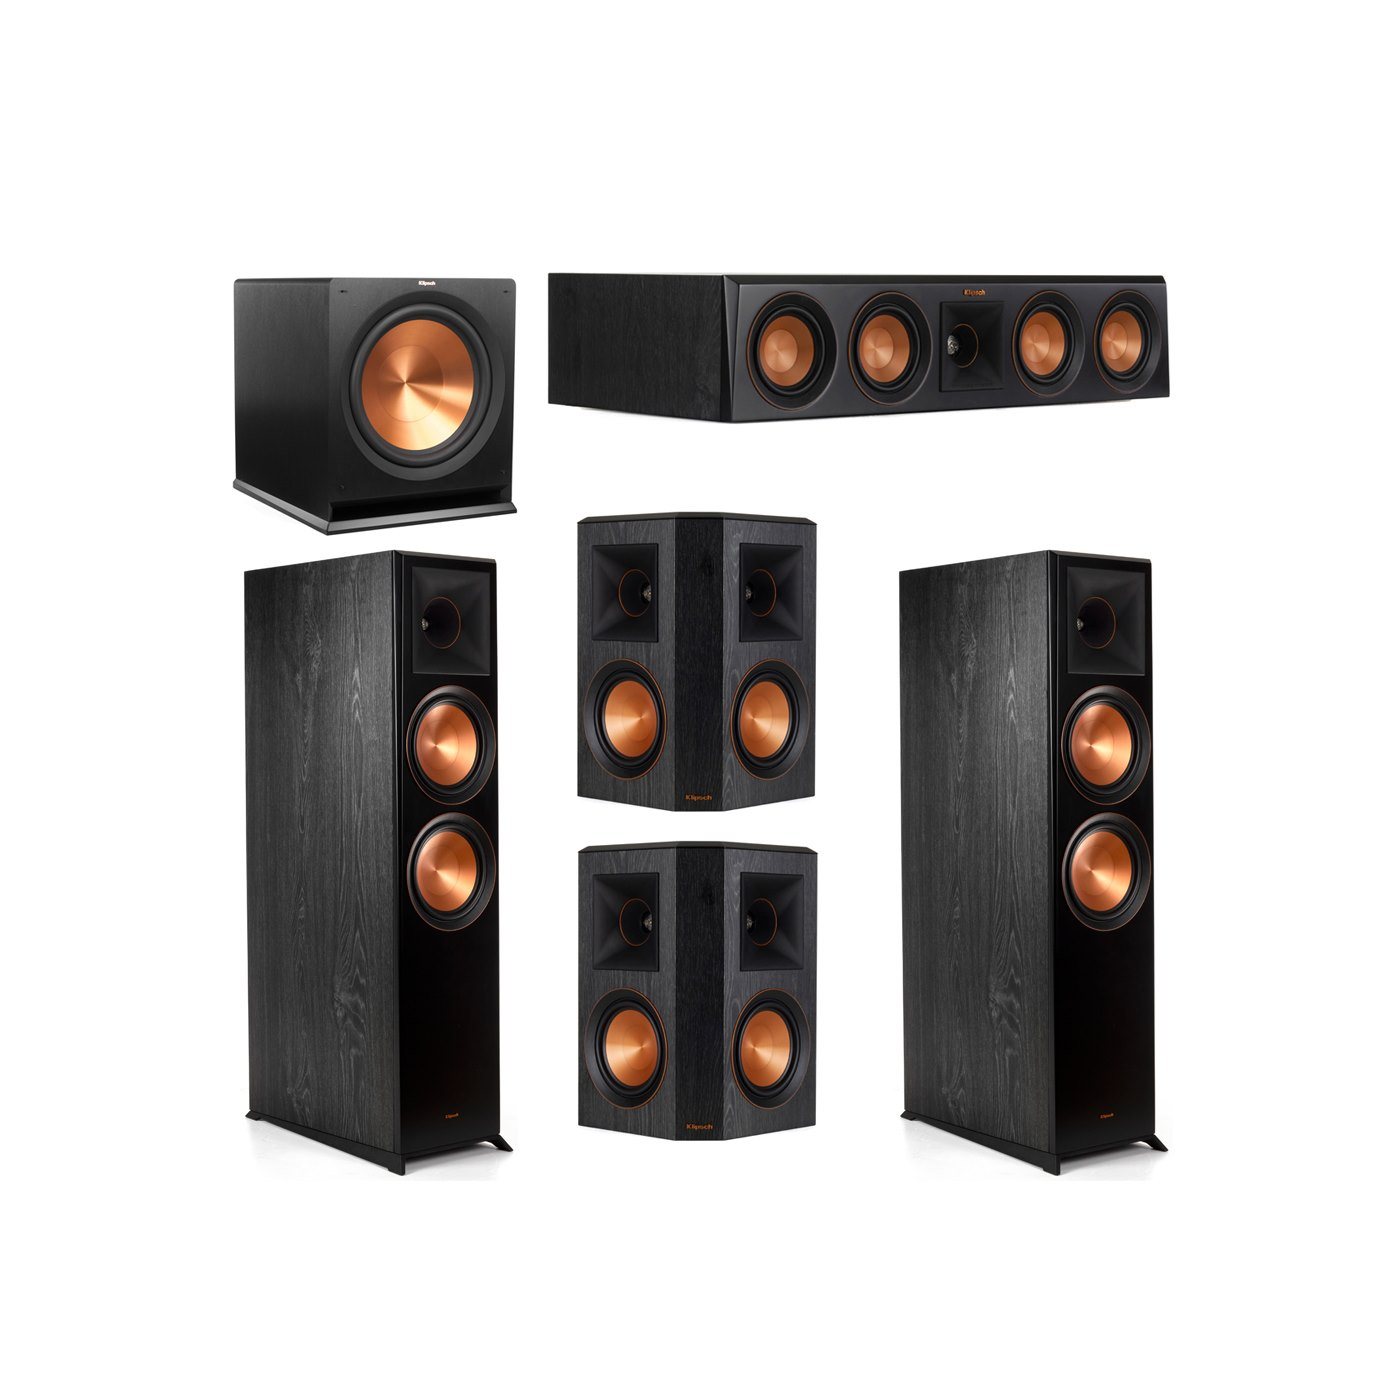 Klipsch 5.1 System with 2 RP-8000F Floorstanding Speakers, 1 Klipsch RP-404C Center Speaker, 2 Klipsch RP-502S Surround Speakers, 1 Klipsch R-115SW Subwoofer